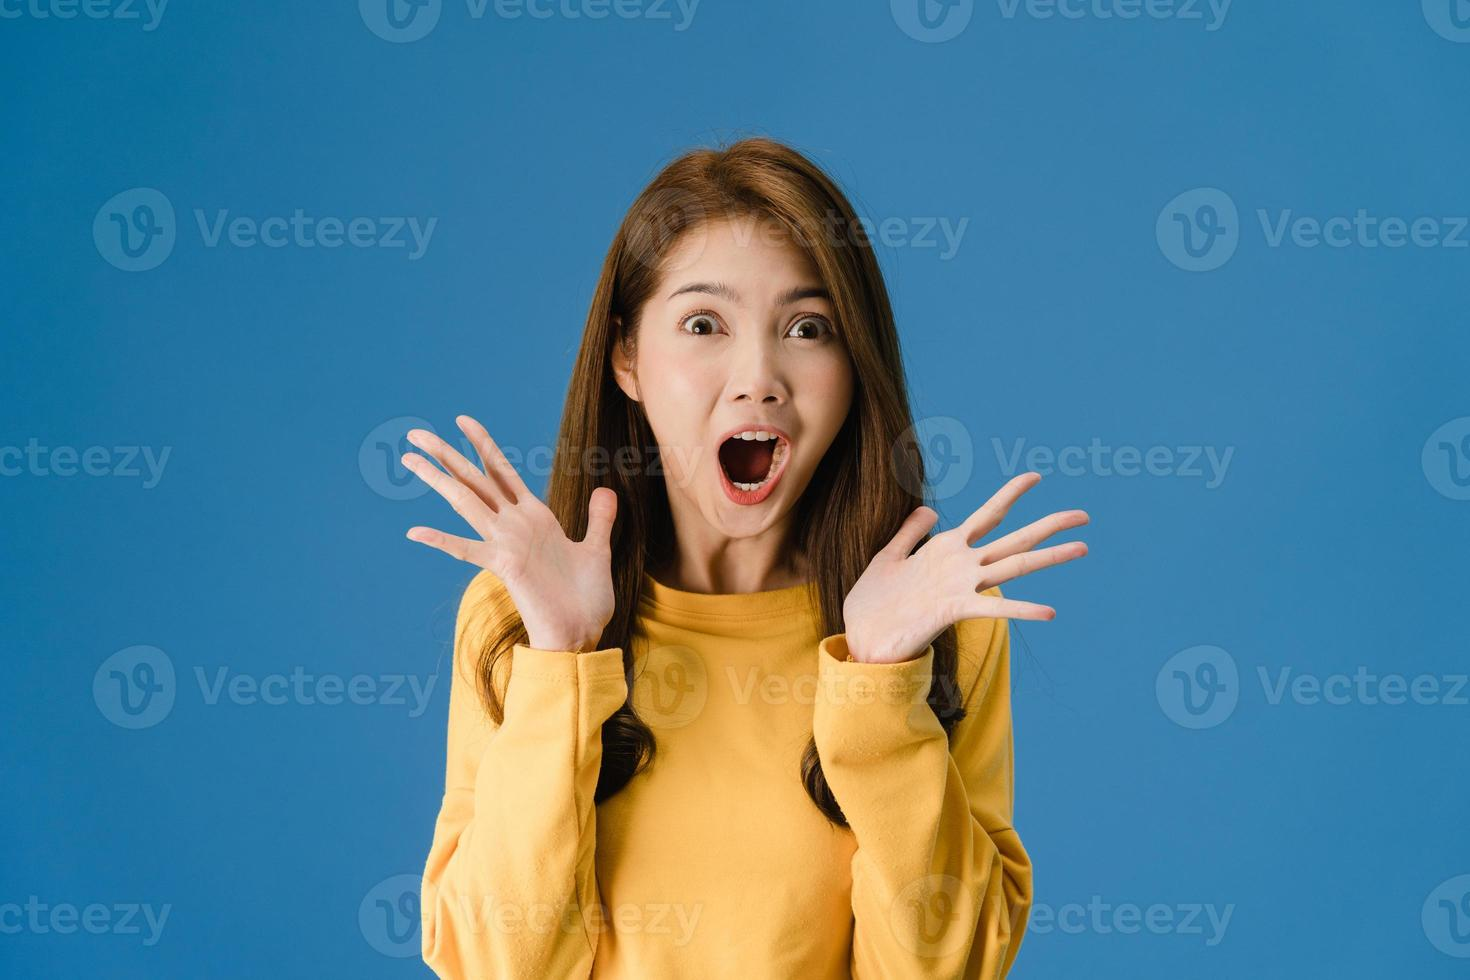 jovem sentindo felicidade alegre surpresa funky sobre fundo azul. foto